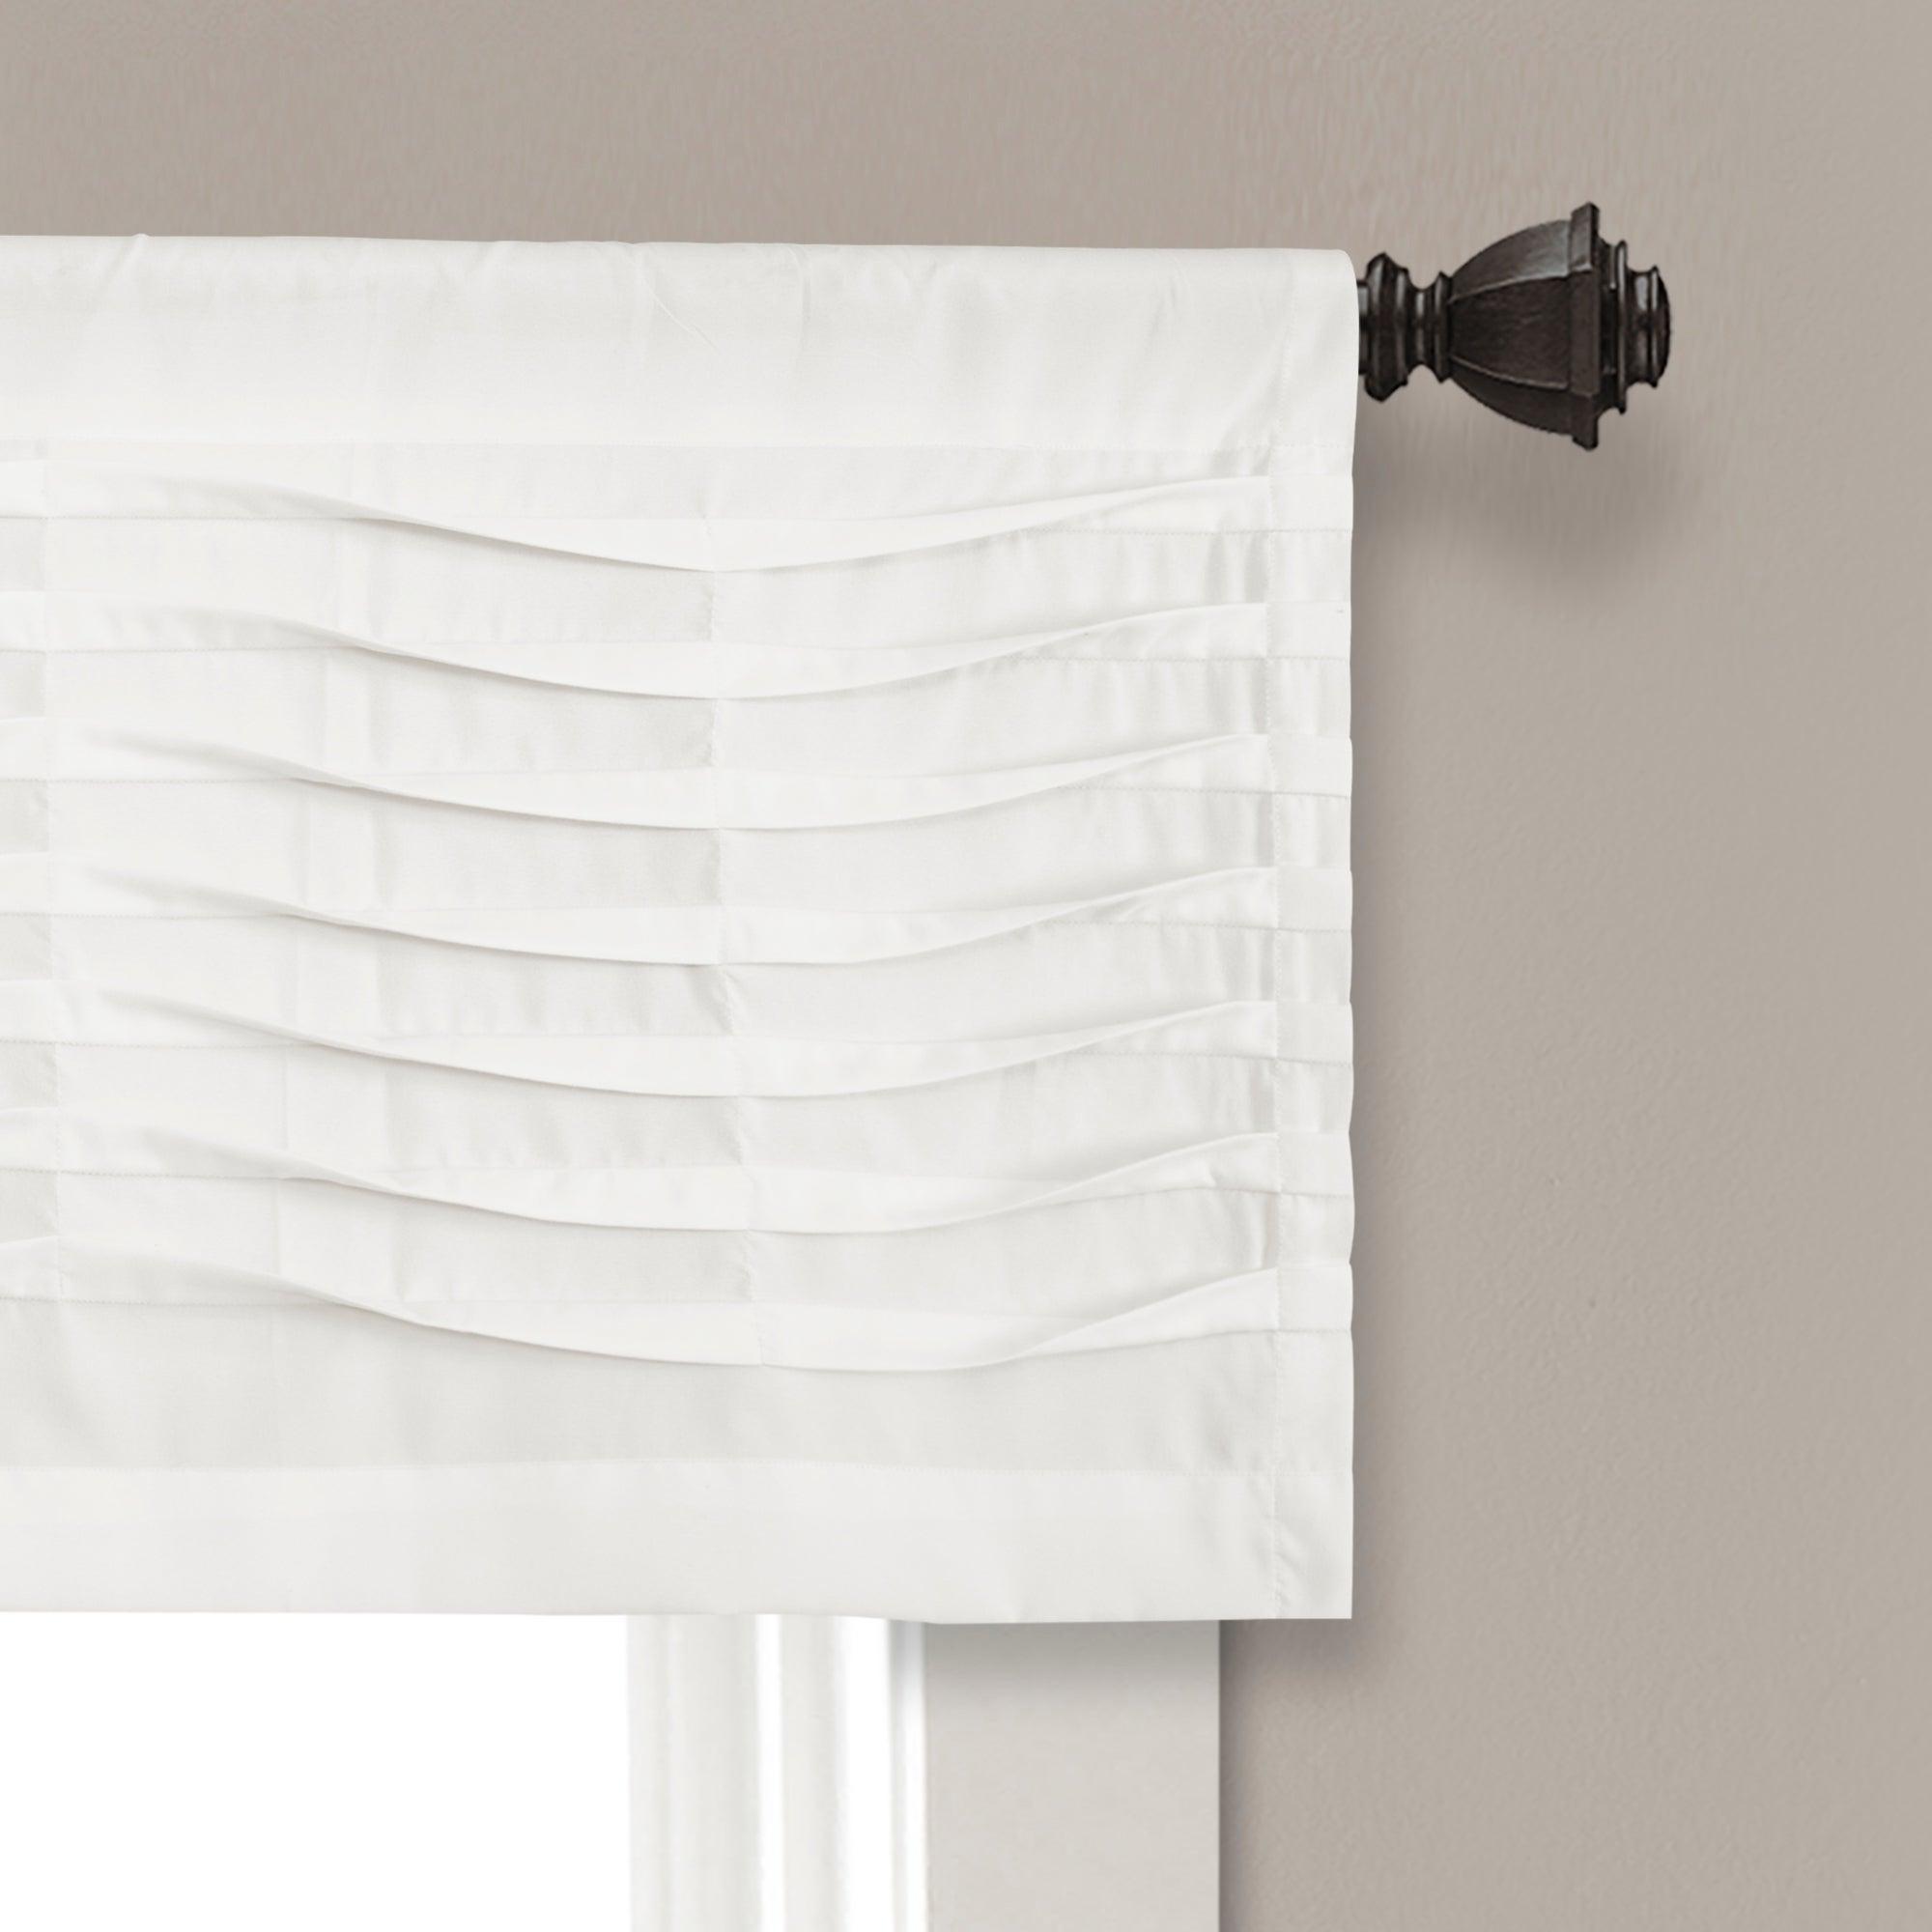 Most Recently Released Details About Porch & Den Kinnaman Wave Texture Window Curtain Valance Regarding Porch & Den Lorentz Silver 24 Inch Tier Pairs (Gallery 11 of 20)